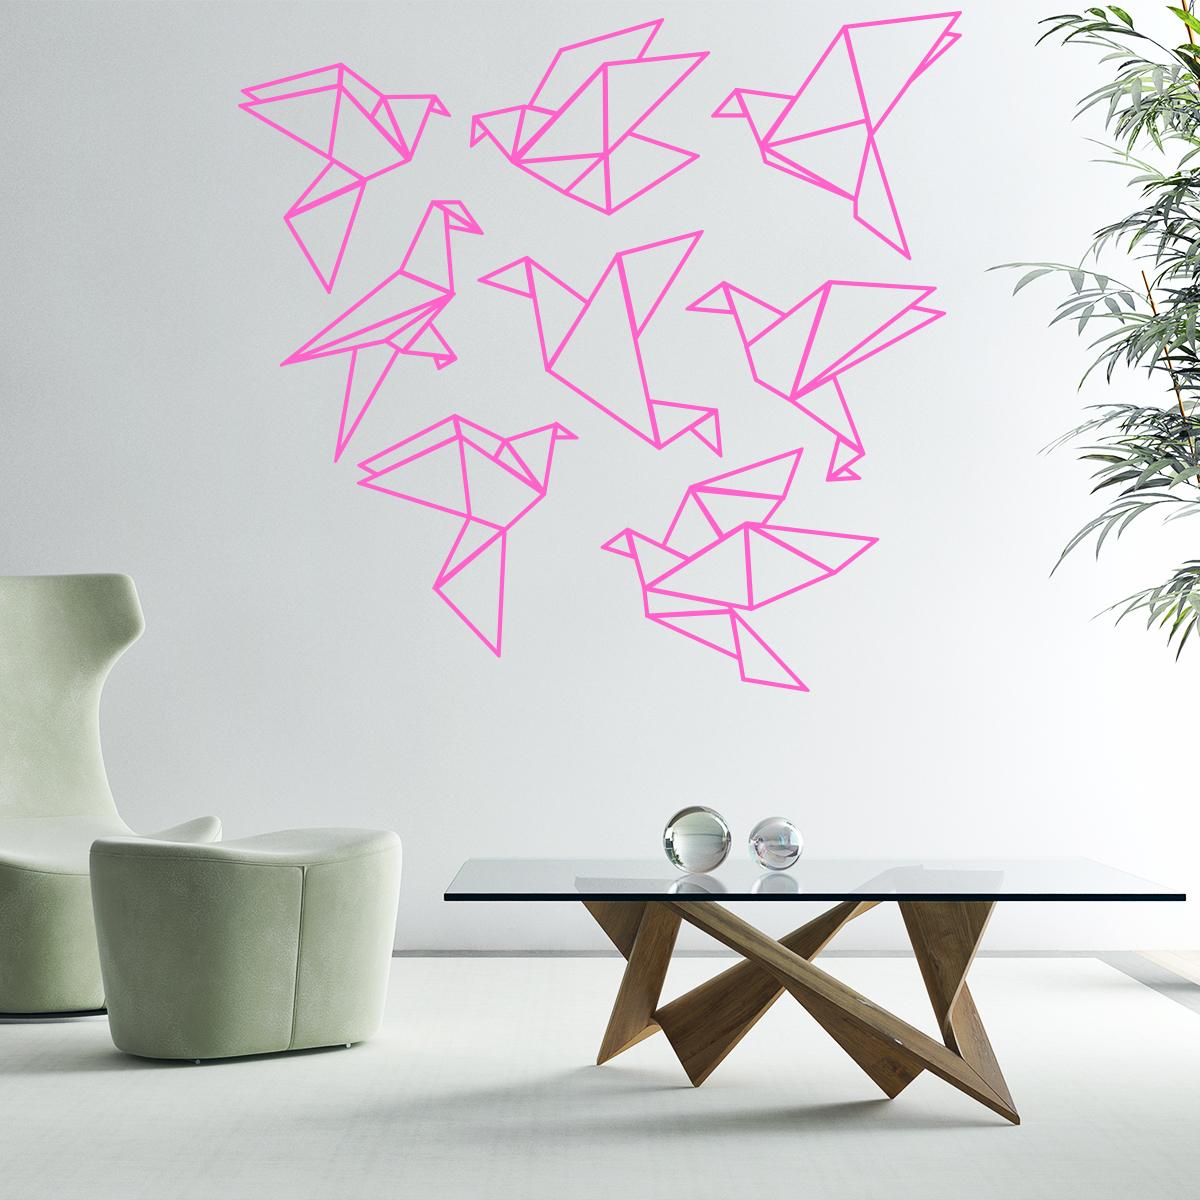 sticker origami 8 oiseaux stickers animaux oiseaux ambiance sticker. Black Bedroom Furniture Sets. Home Design Ideas